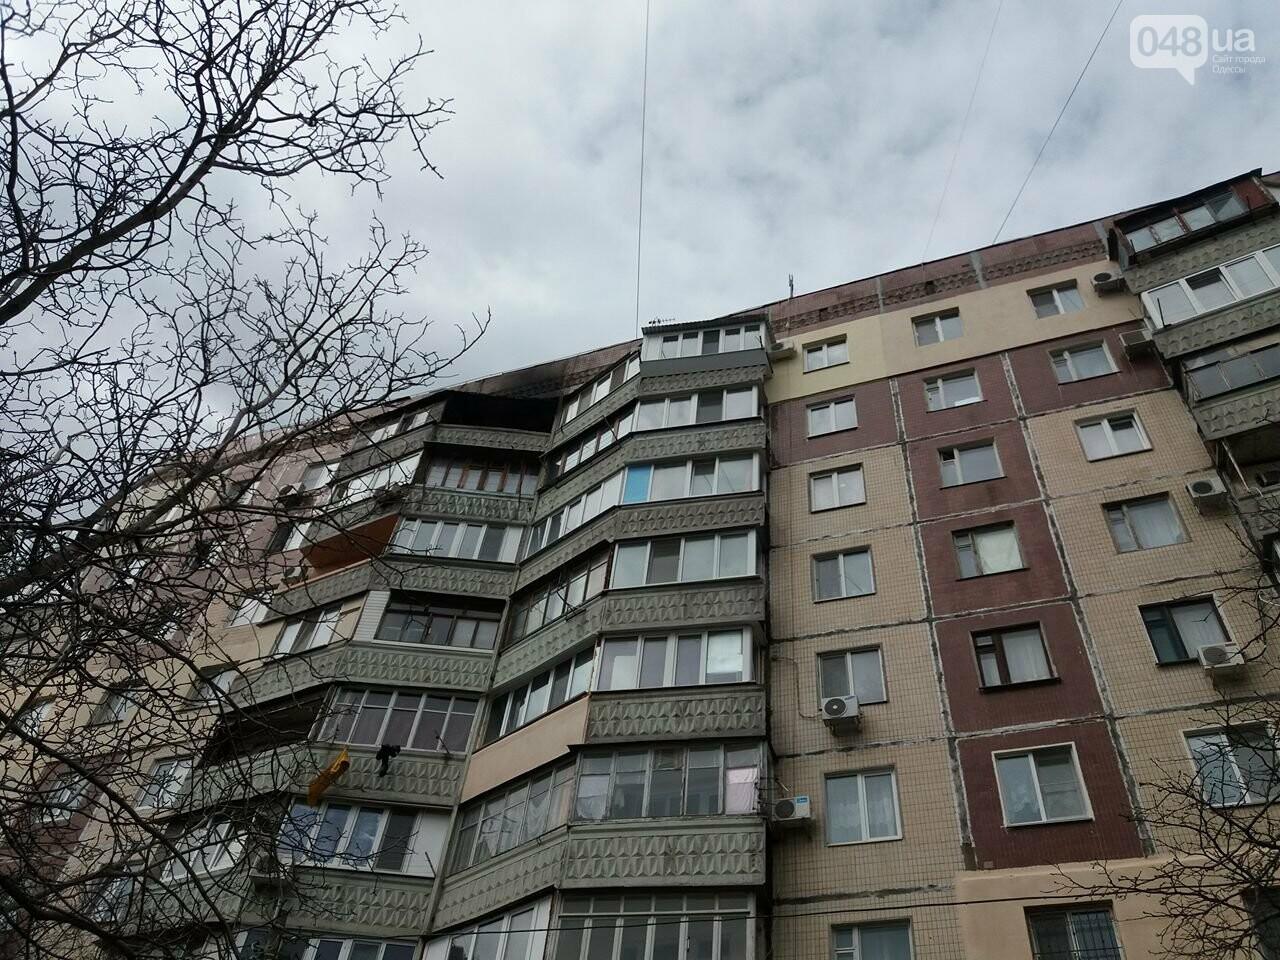 В Одессе горел балкон девятиэтажного дома (ФОТО, ВИДЕО), фото-4